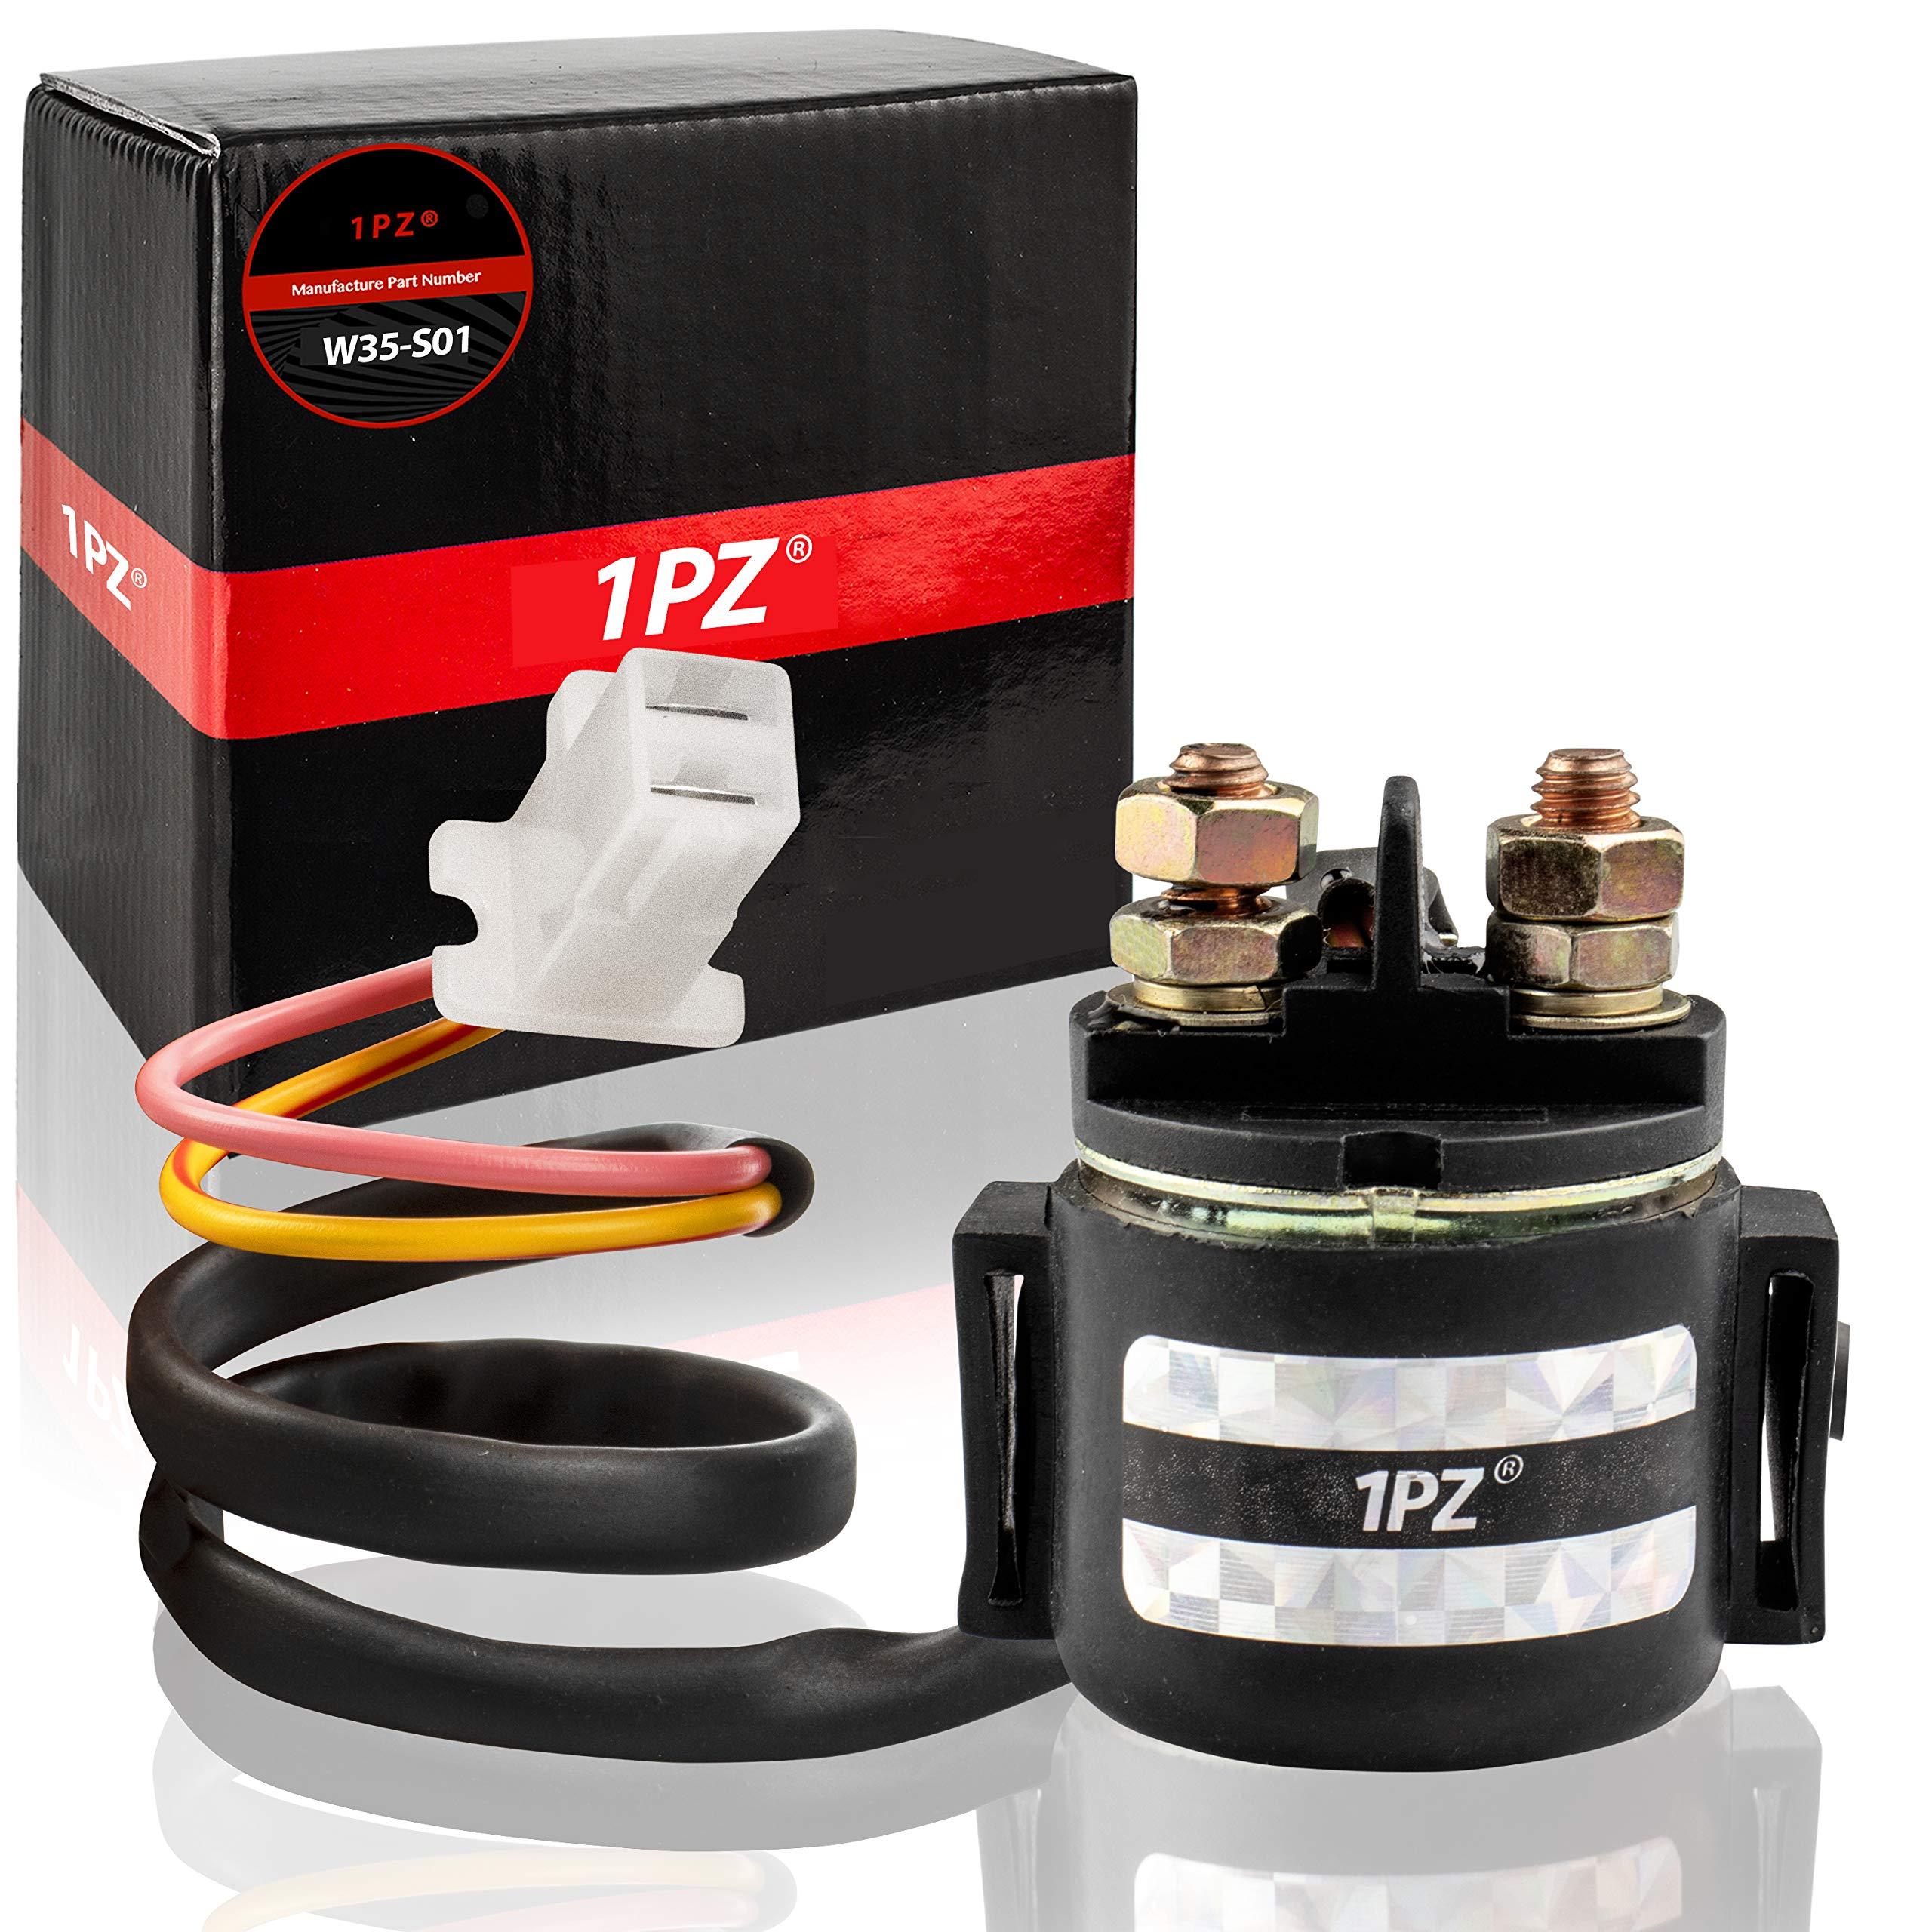 1PZ W35-S01 Premium Starter Solenoid Relay for Yamaha Warrior 350 YFM350 1987 1988 1989 1990 1991 1992 1993 1994 1995 1996 1997 1998 1999 2000 2001 2002 2003 2004 by 1PZ